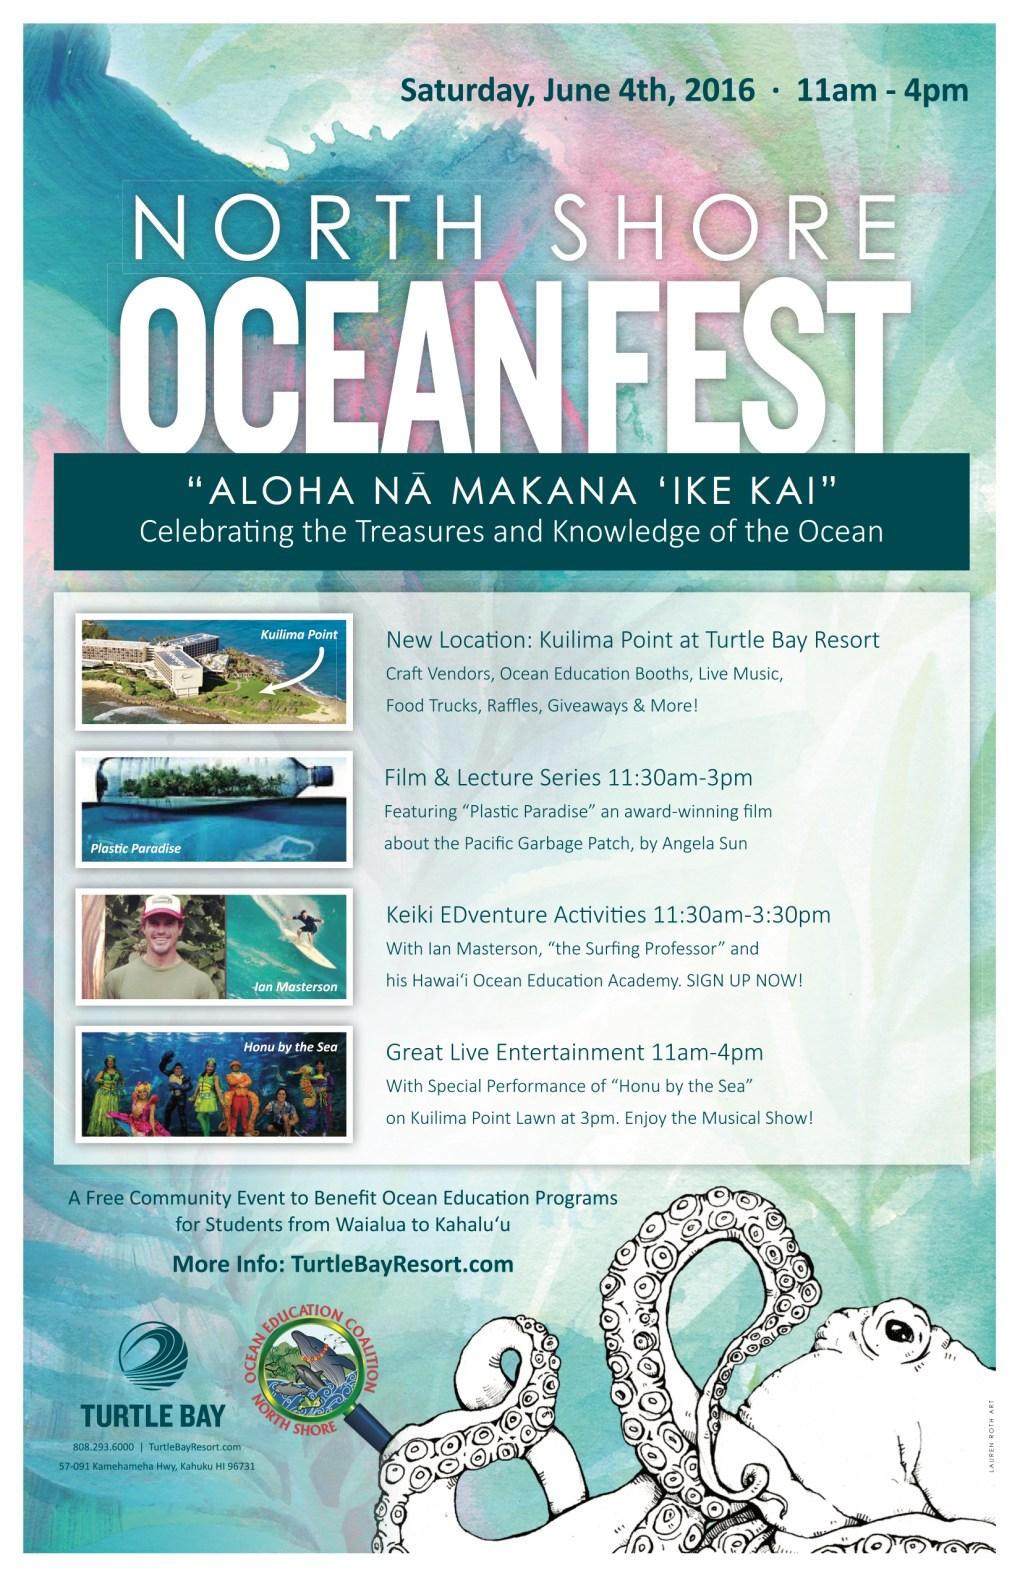 TBR_OceanFest2016_Flyer11x17_Update050616[3][1][2]